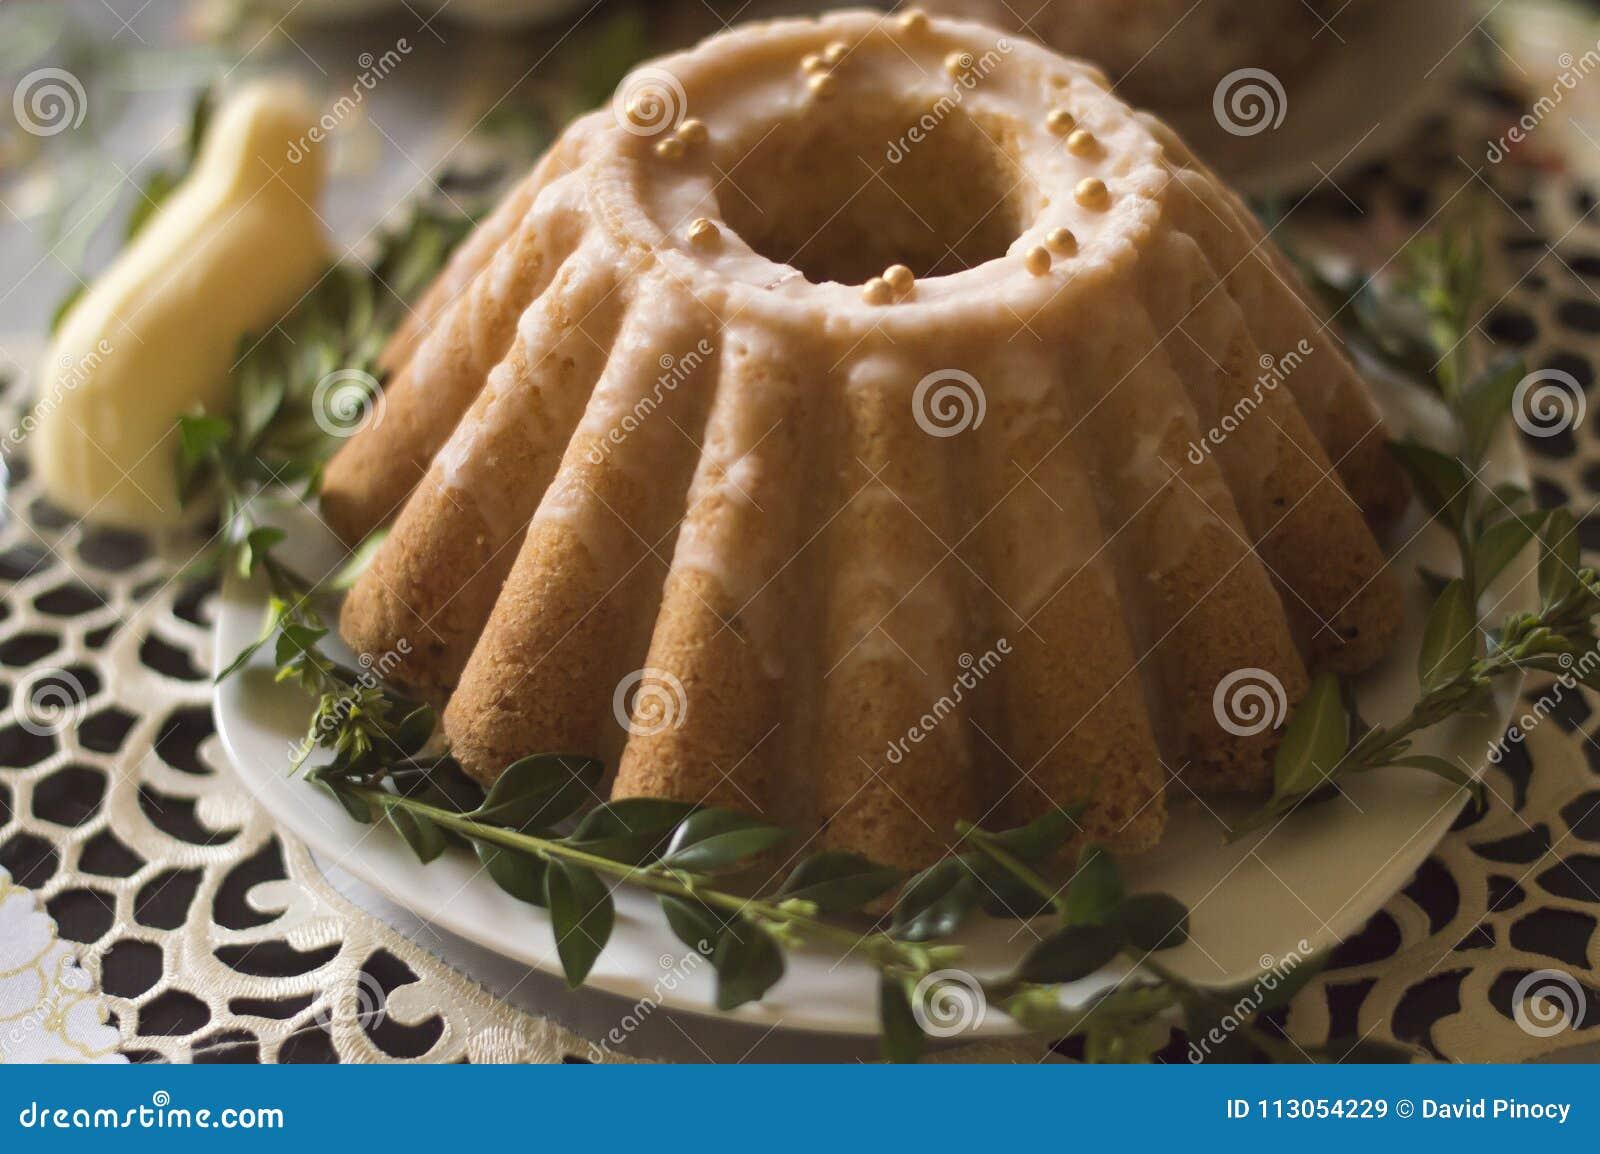 Pondcake, de traditionele cake van Pasen